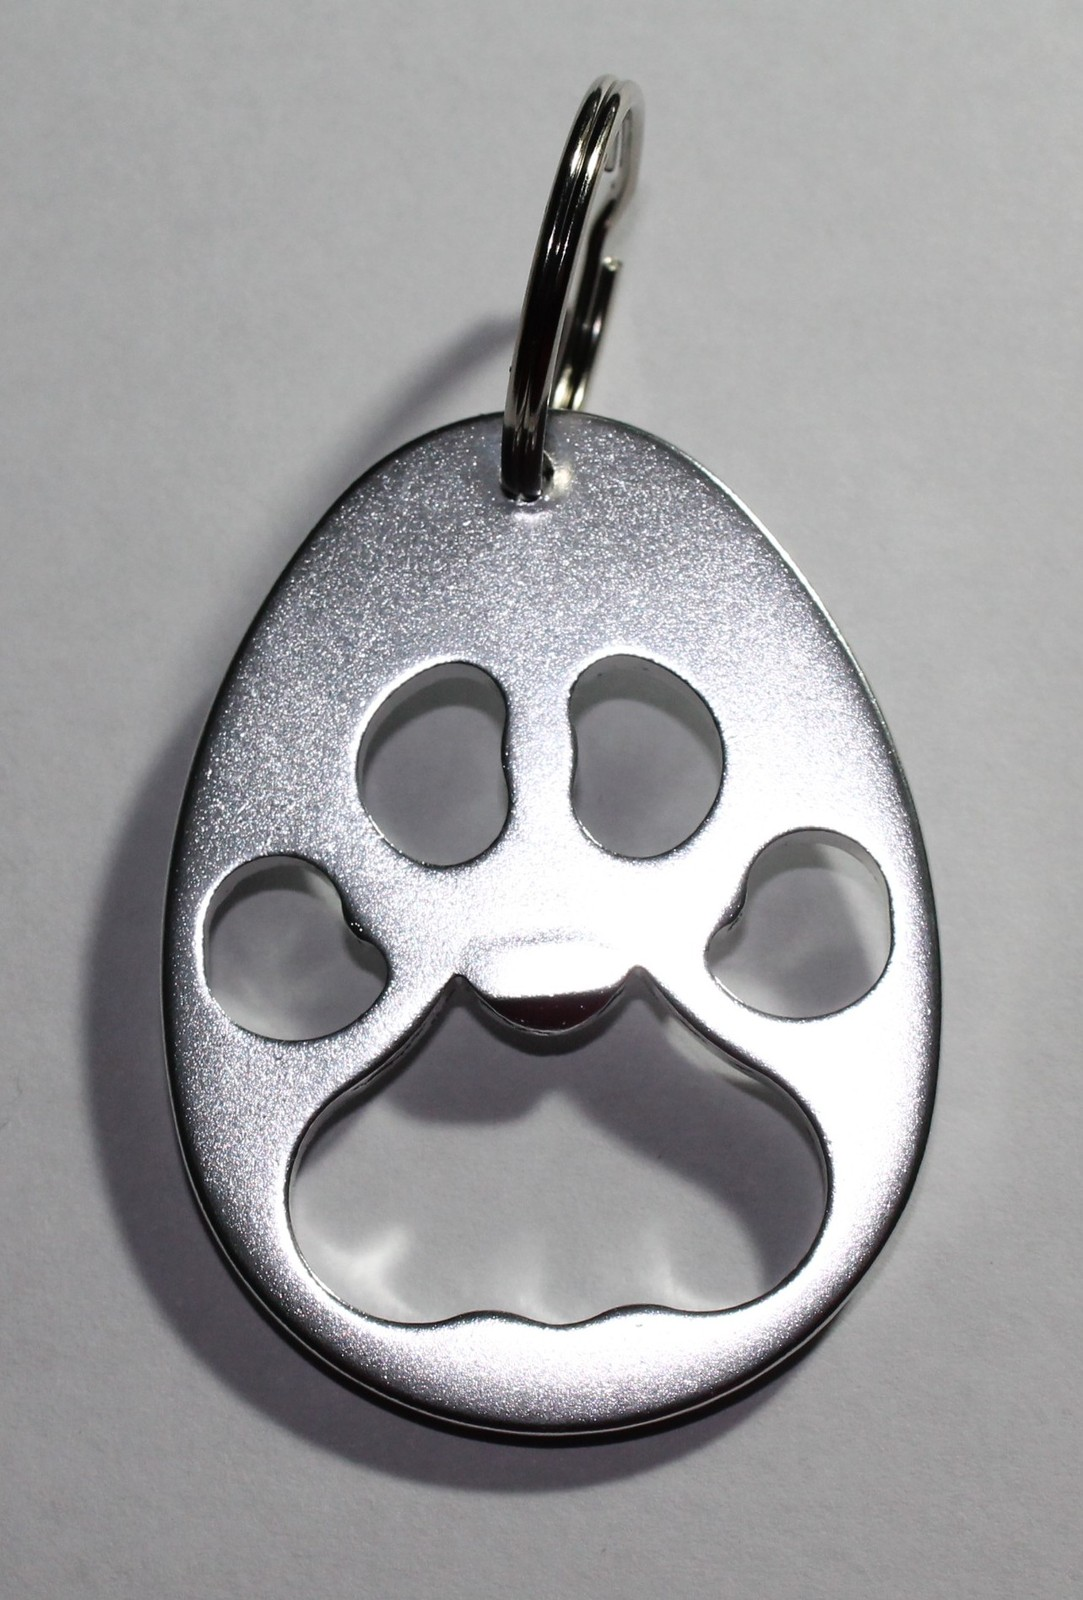 Aluminum Pet Paw Print Bottle Opener Key Ring Chain Dog